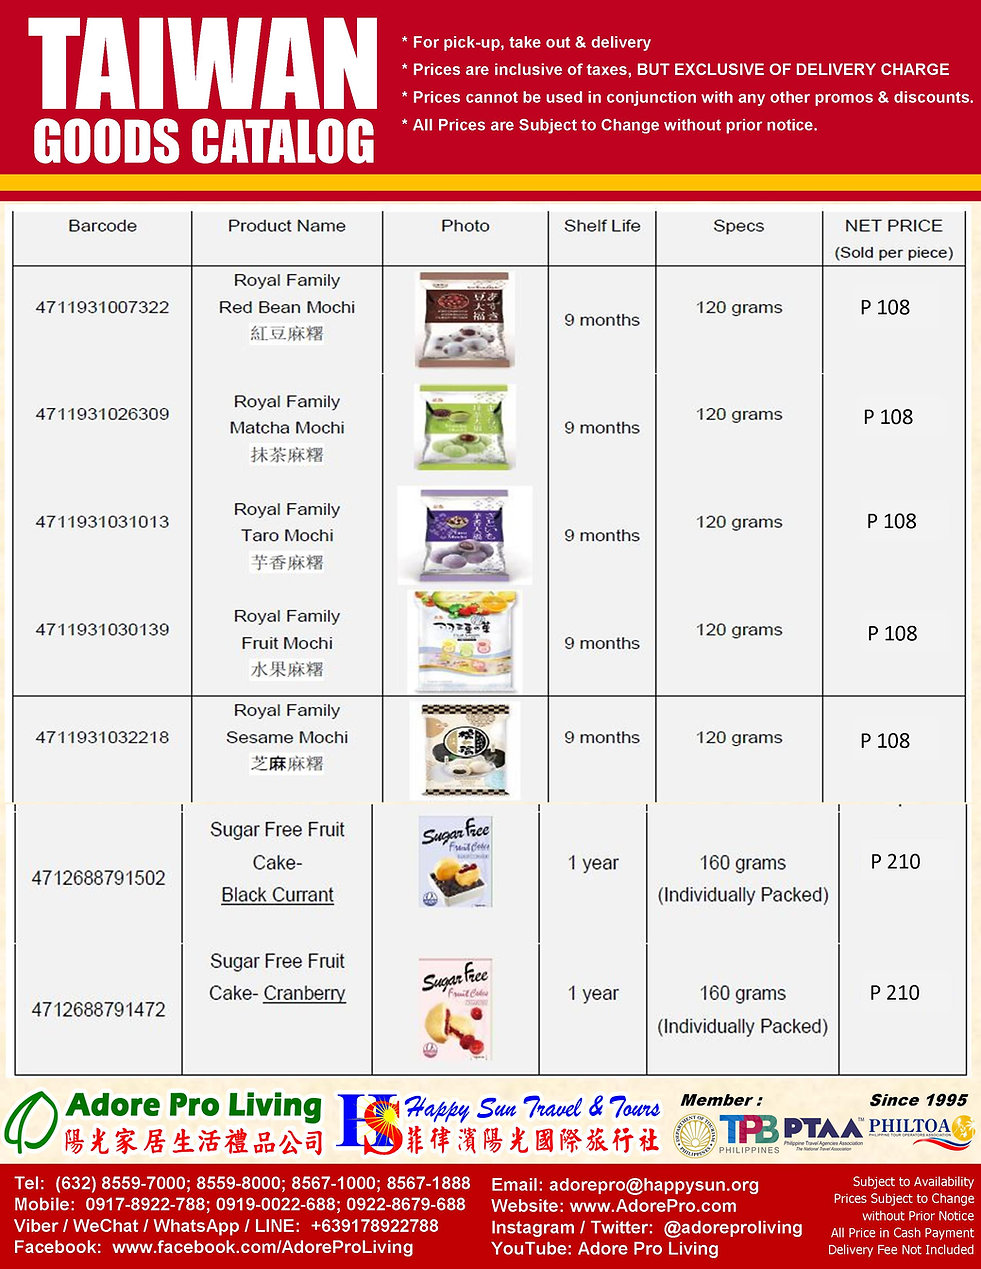 P5_Taiwan Goods Catalog_202009119.jpg